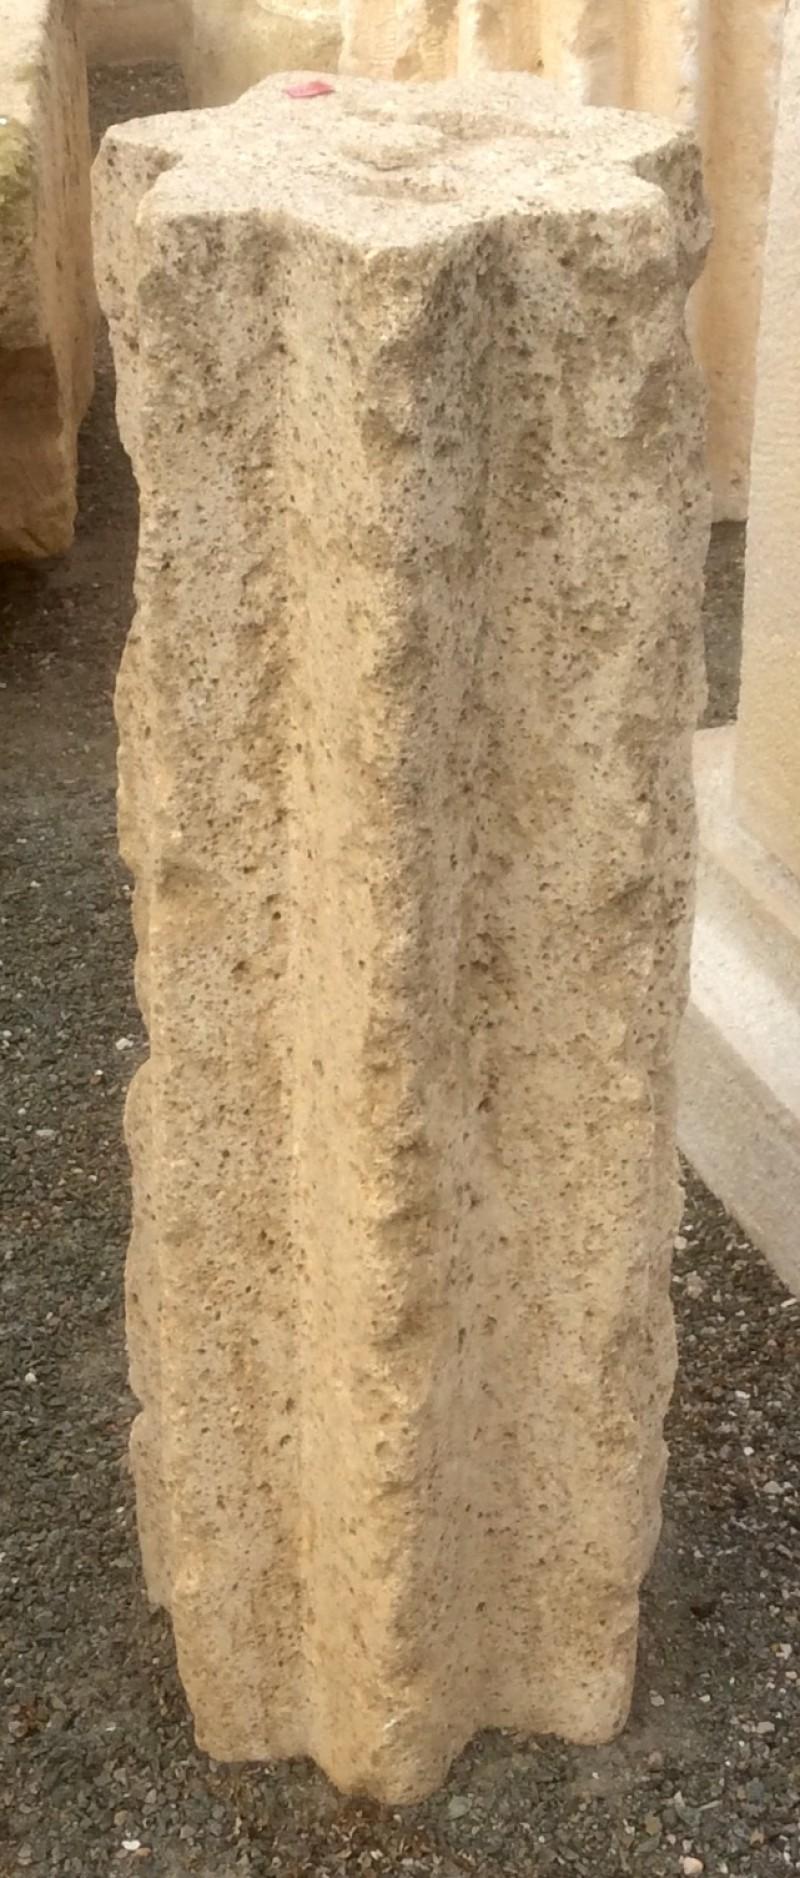 Rulo estriado de piedra caliza. Mide 20 cm de diámetro x 60 cm de alto